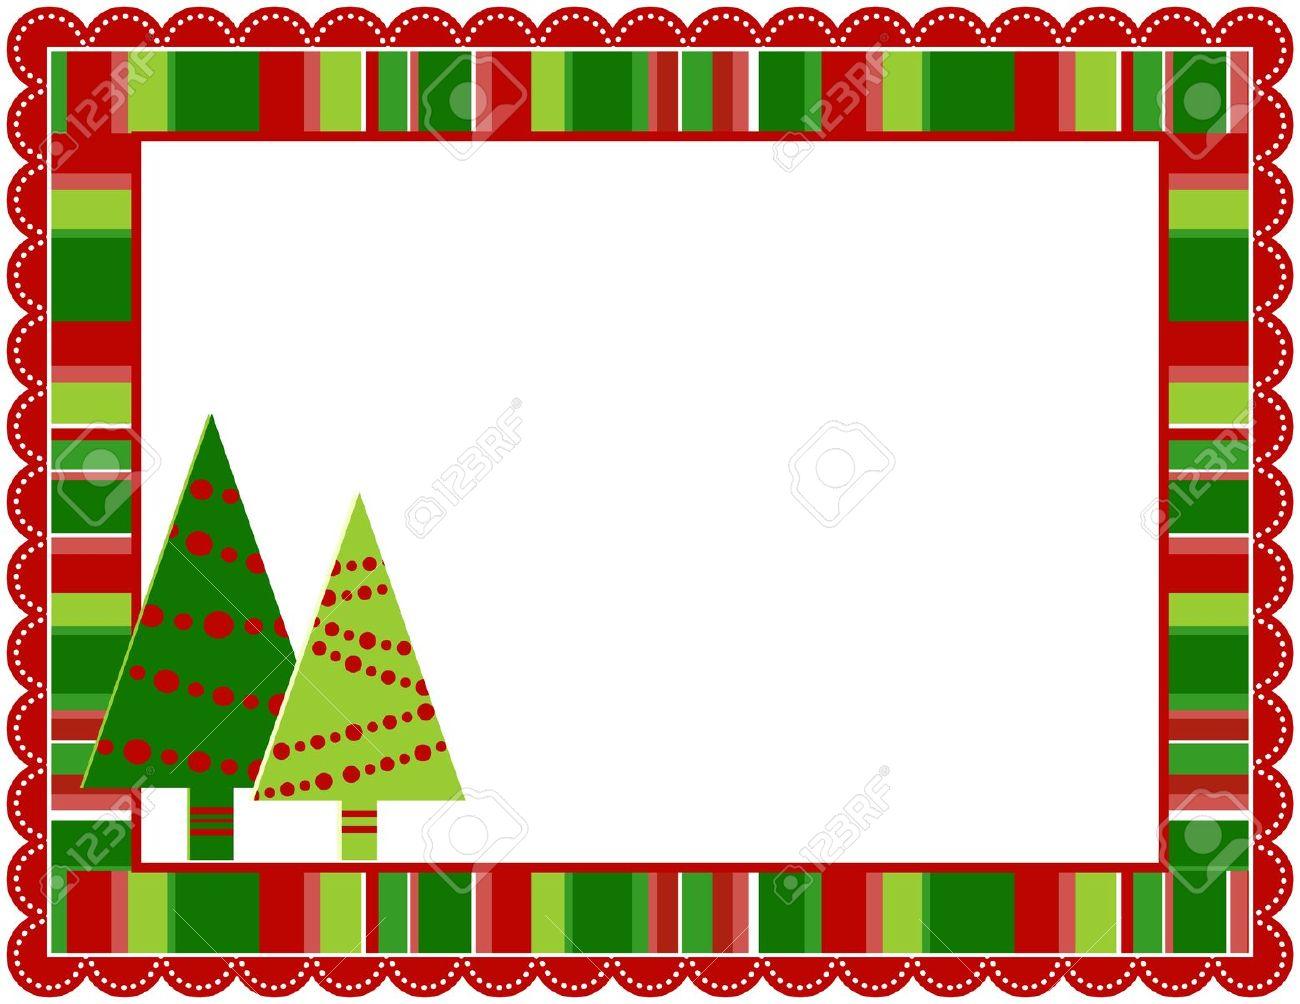 Christmas Border Clipart Landscape.Christmas Border Images Free Download Best Christmas